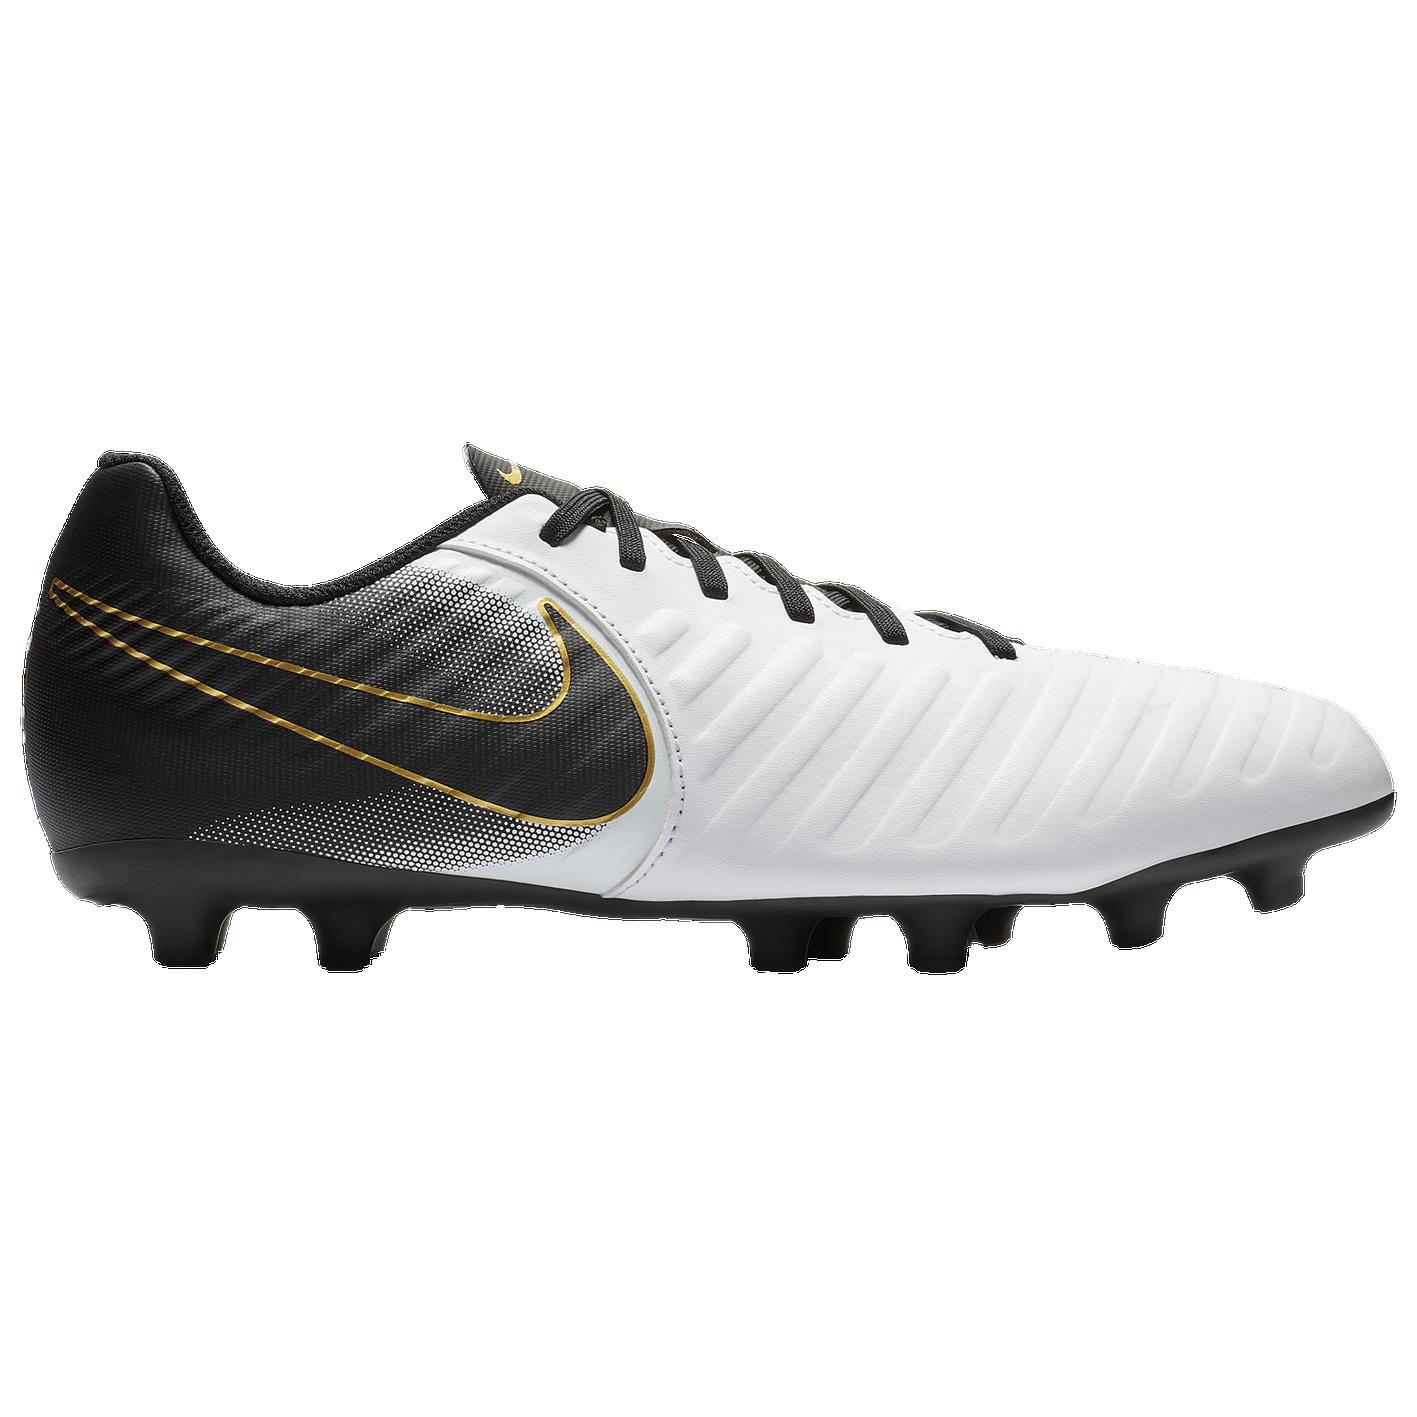 3ed17e267 Nike Tiempo Legend 7 Club MG - Men s - Soccer - Shoes - White Black